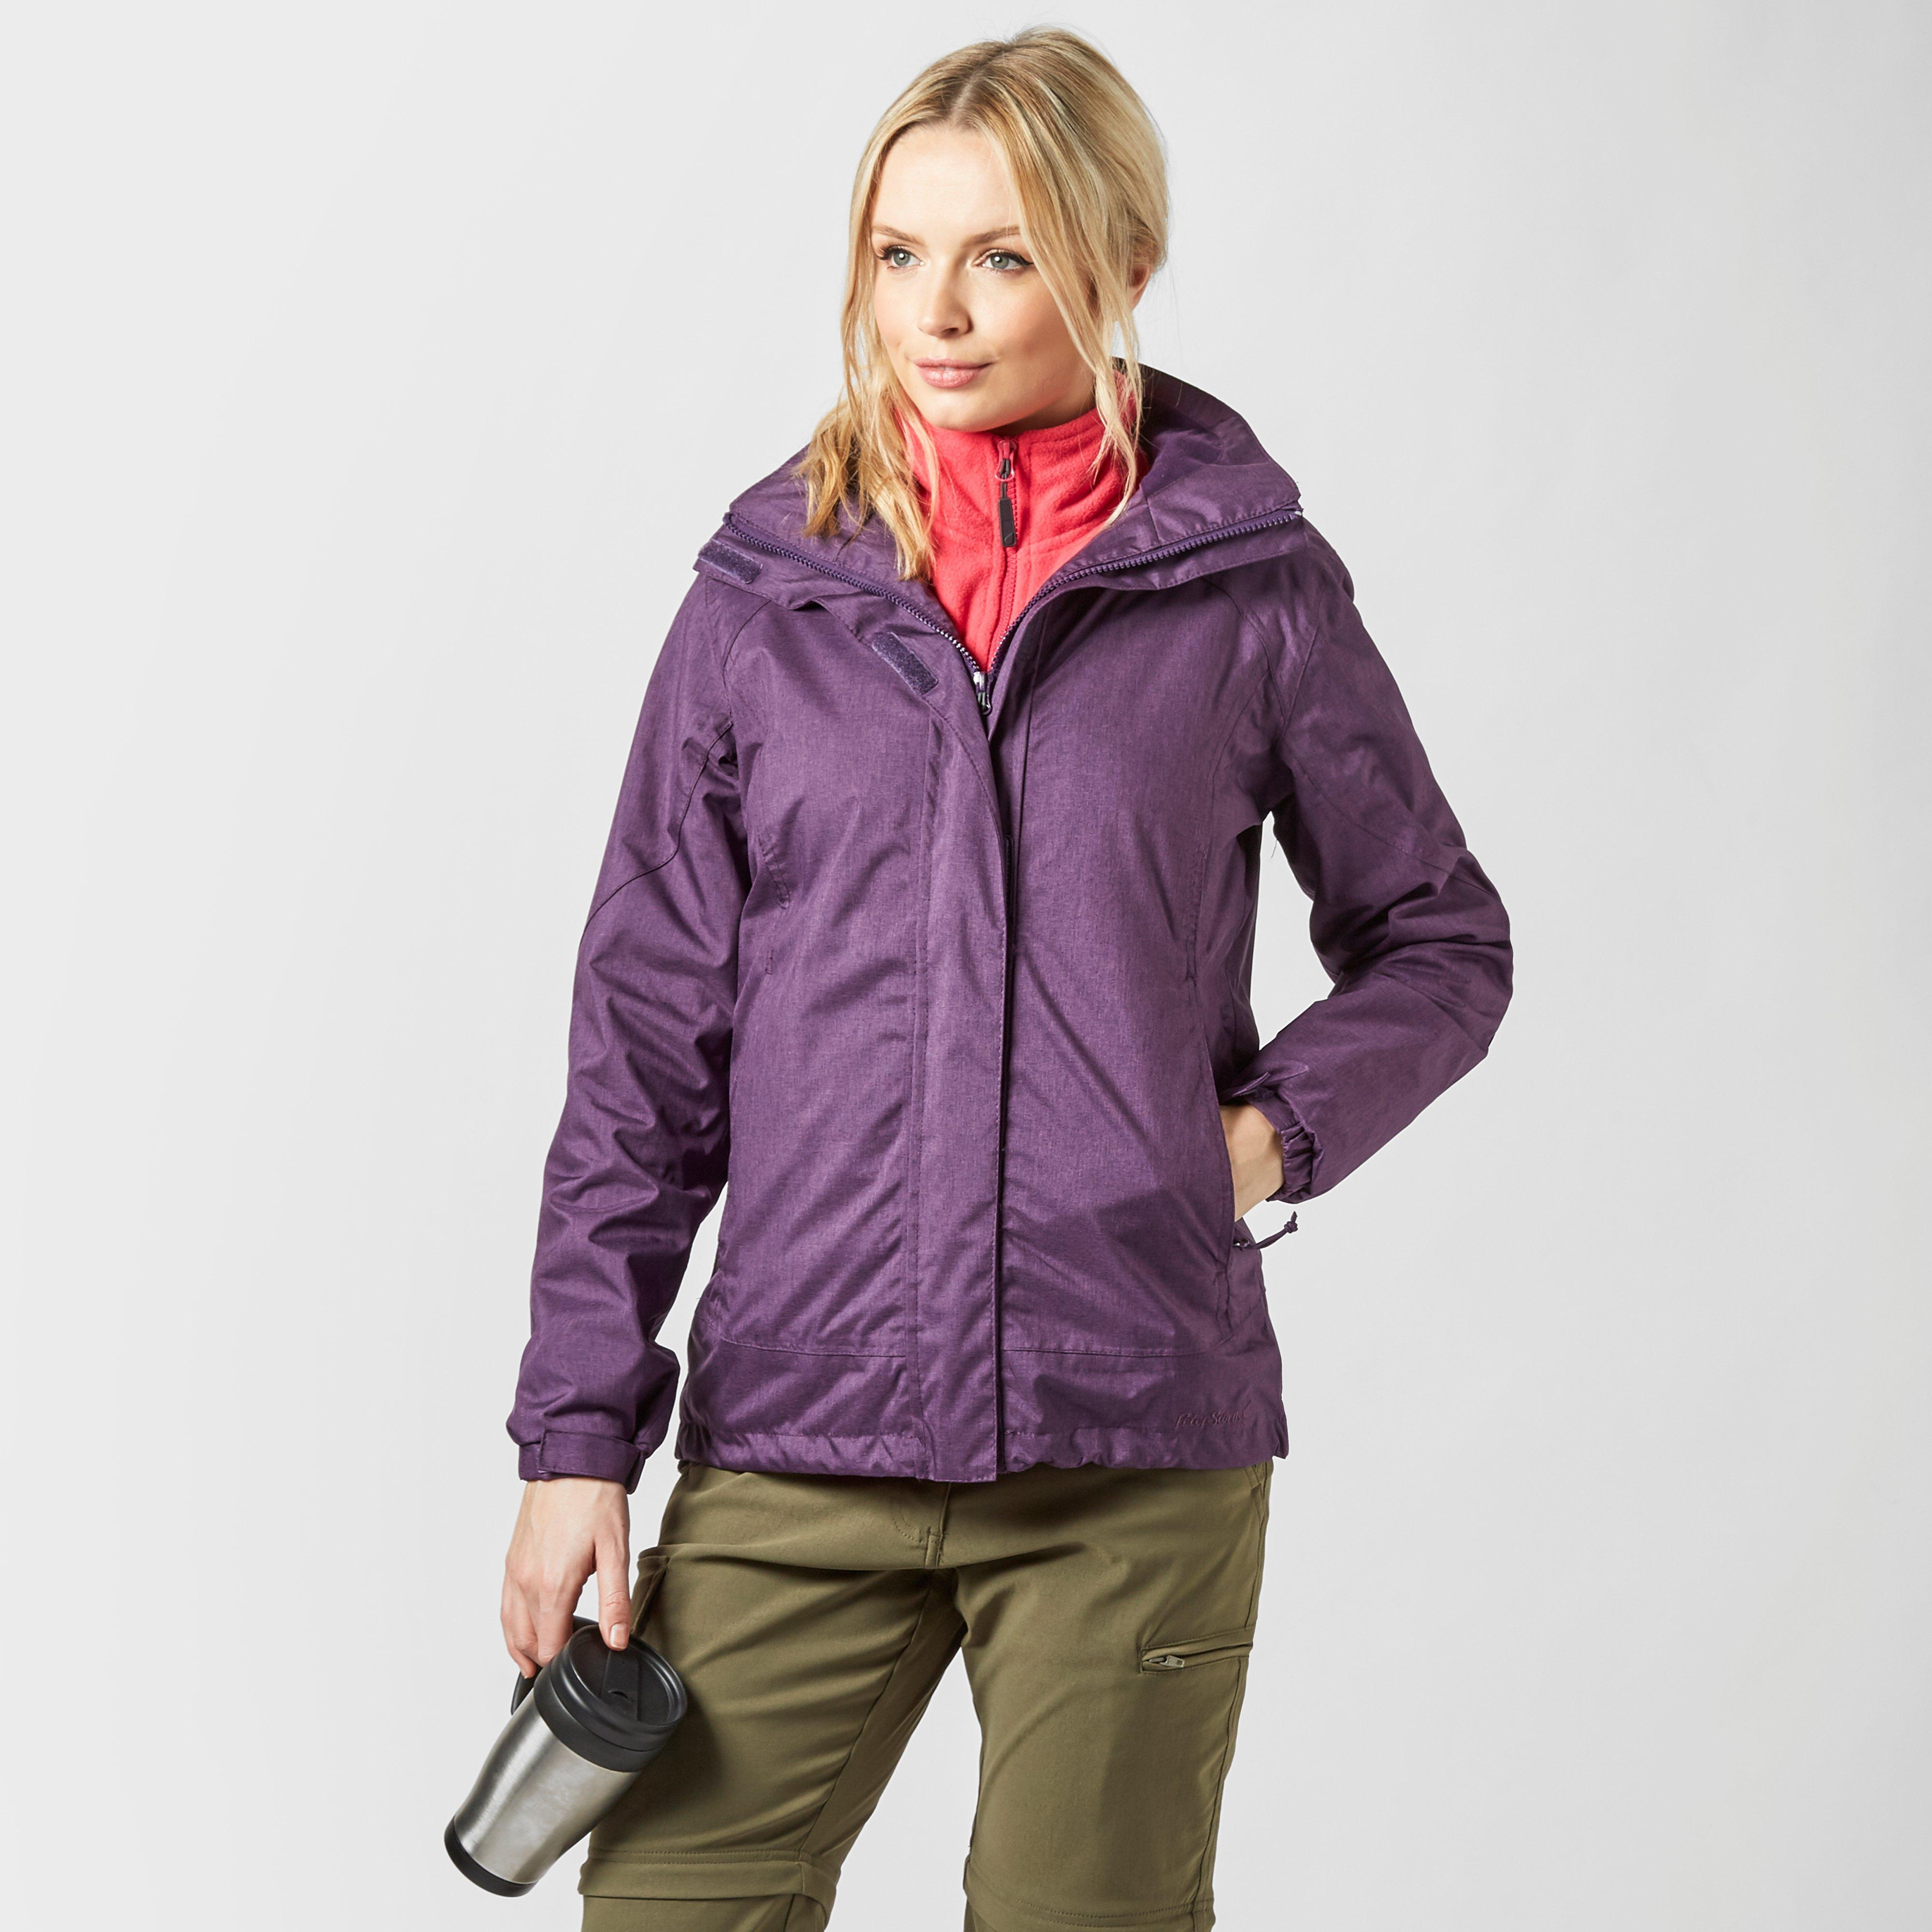 Peter Storm Peter Storm womens Glide Waterproof Jacket - Purple, Purple